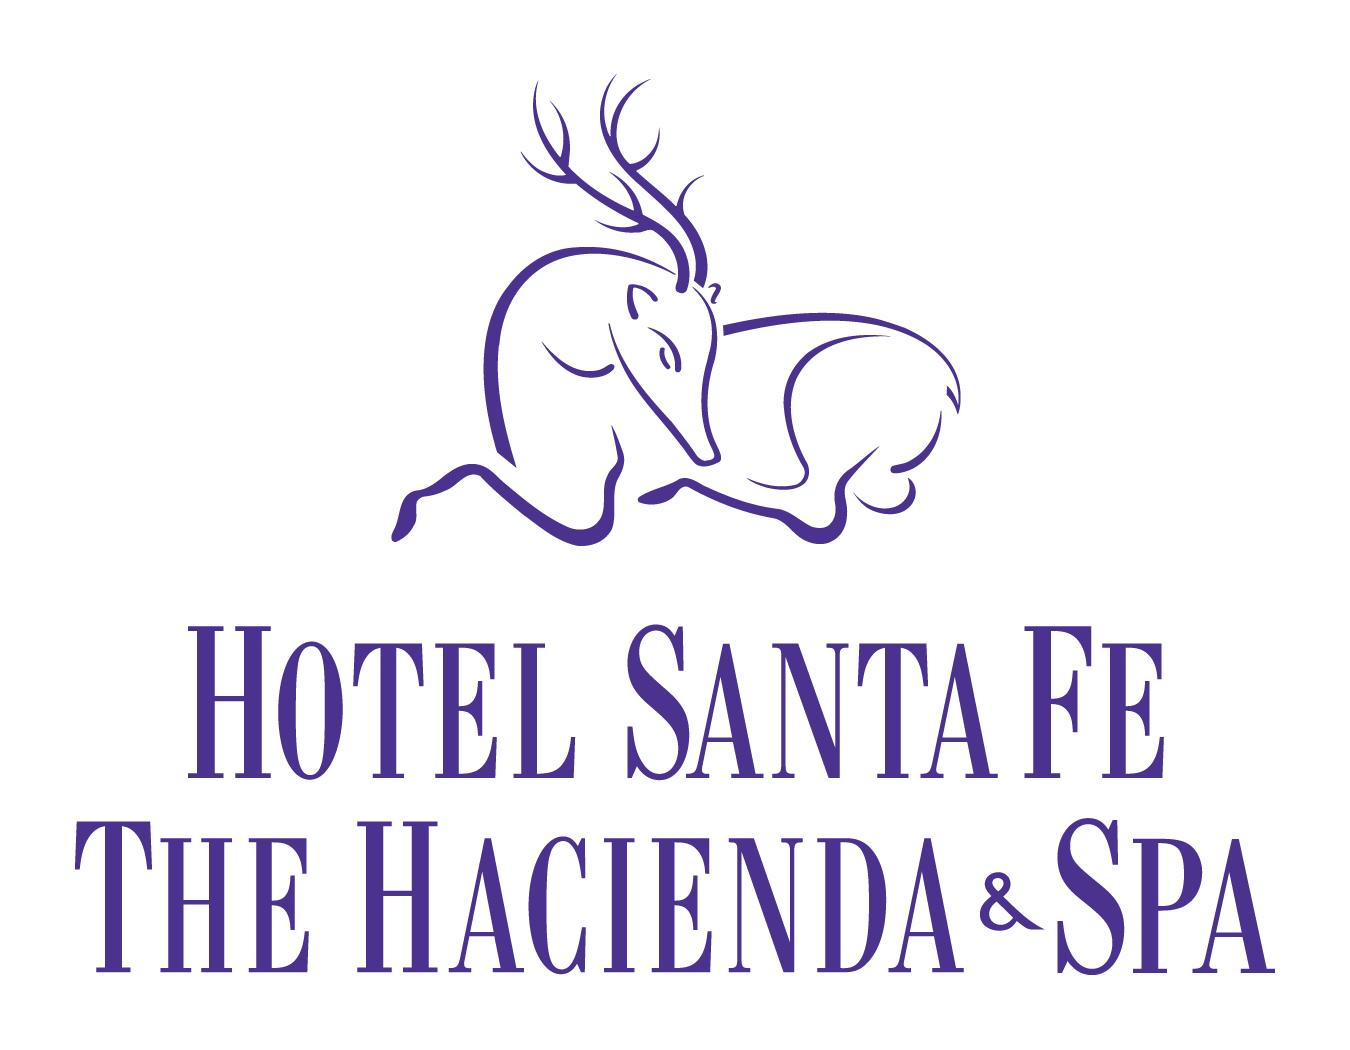 Hotel Santa Fe | Hacienda & Spa